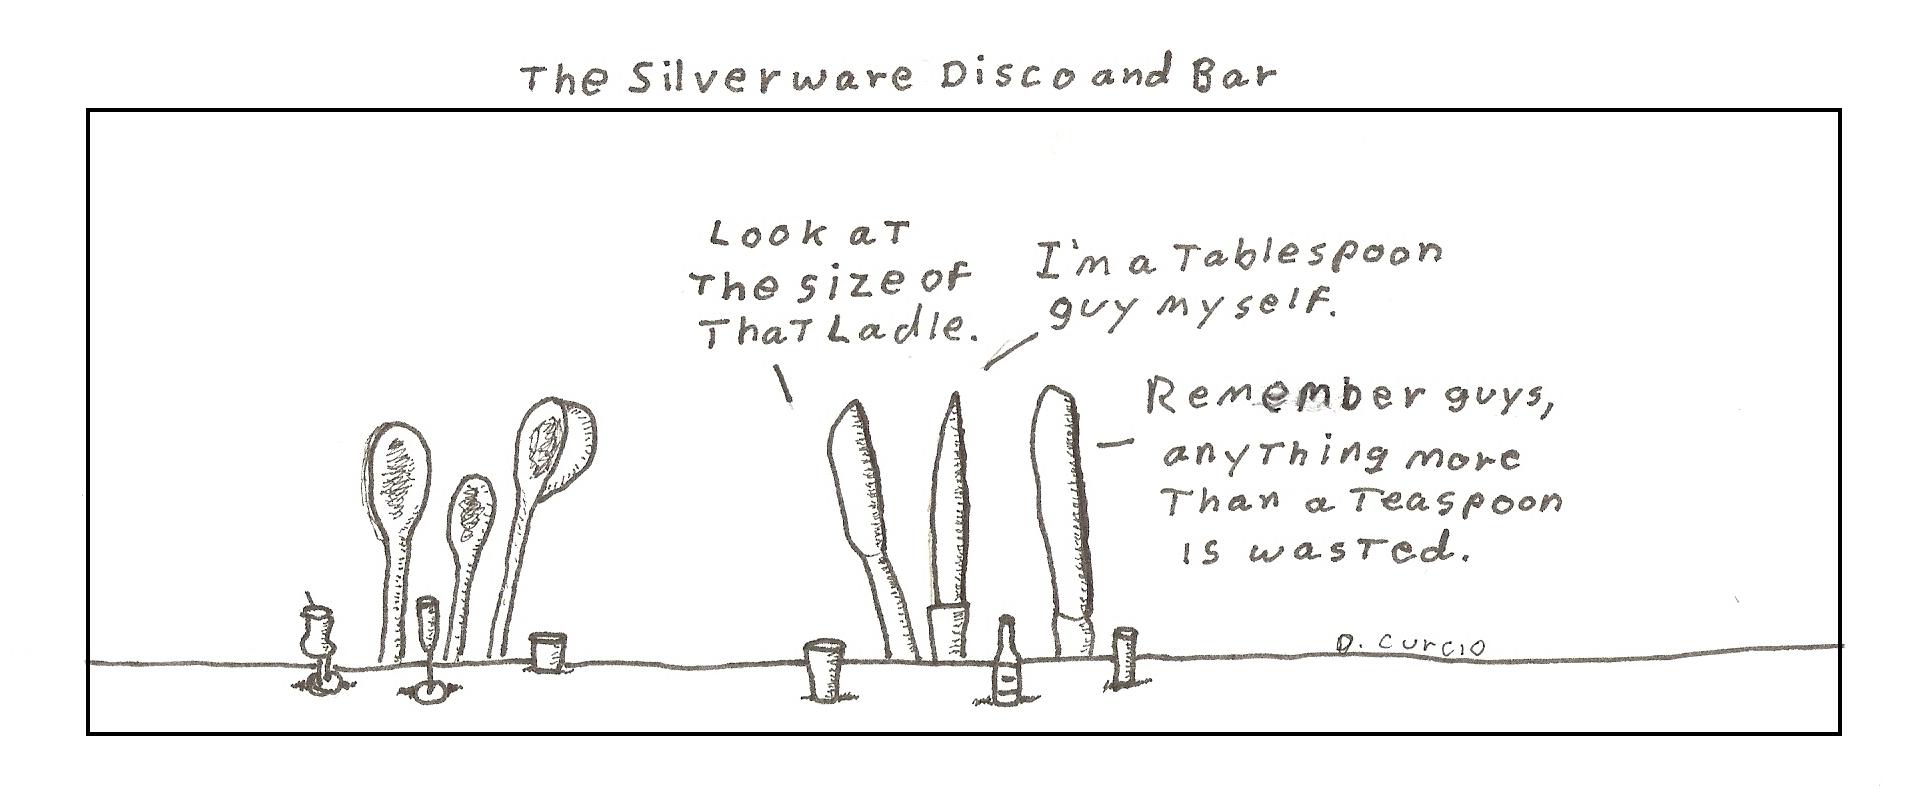 Silverware Disco And Bar 1